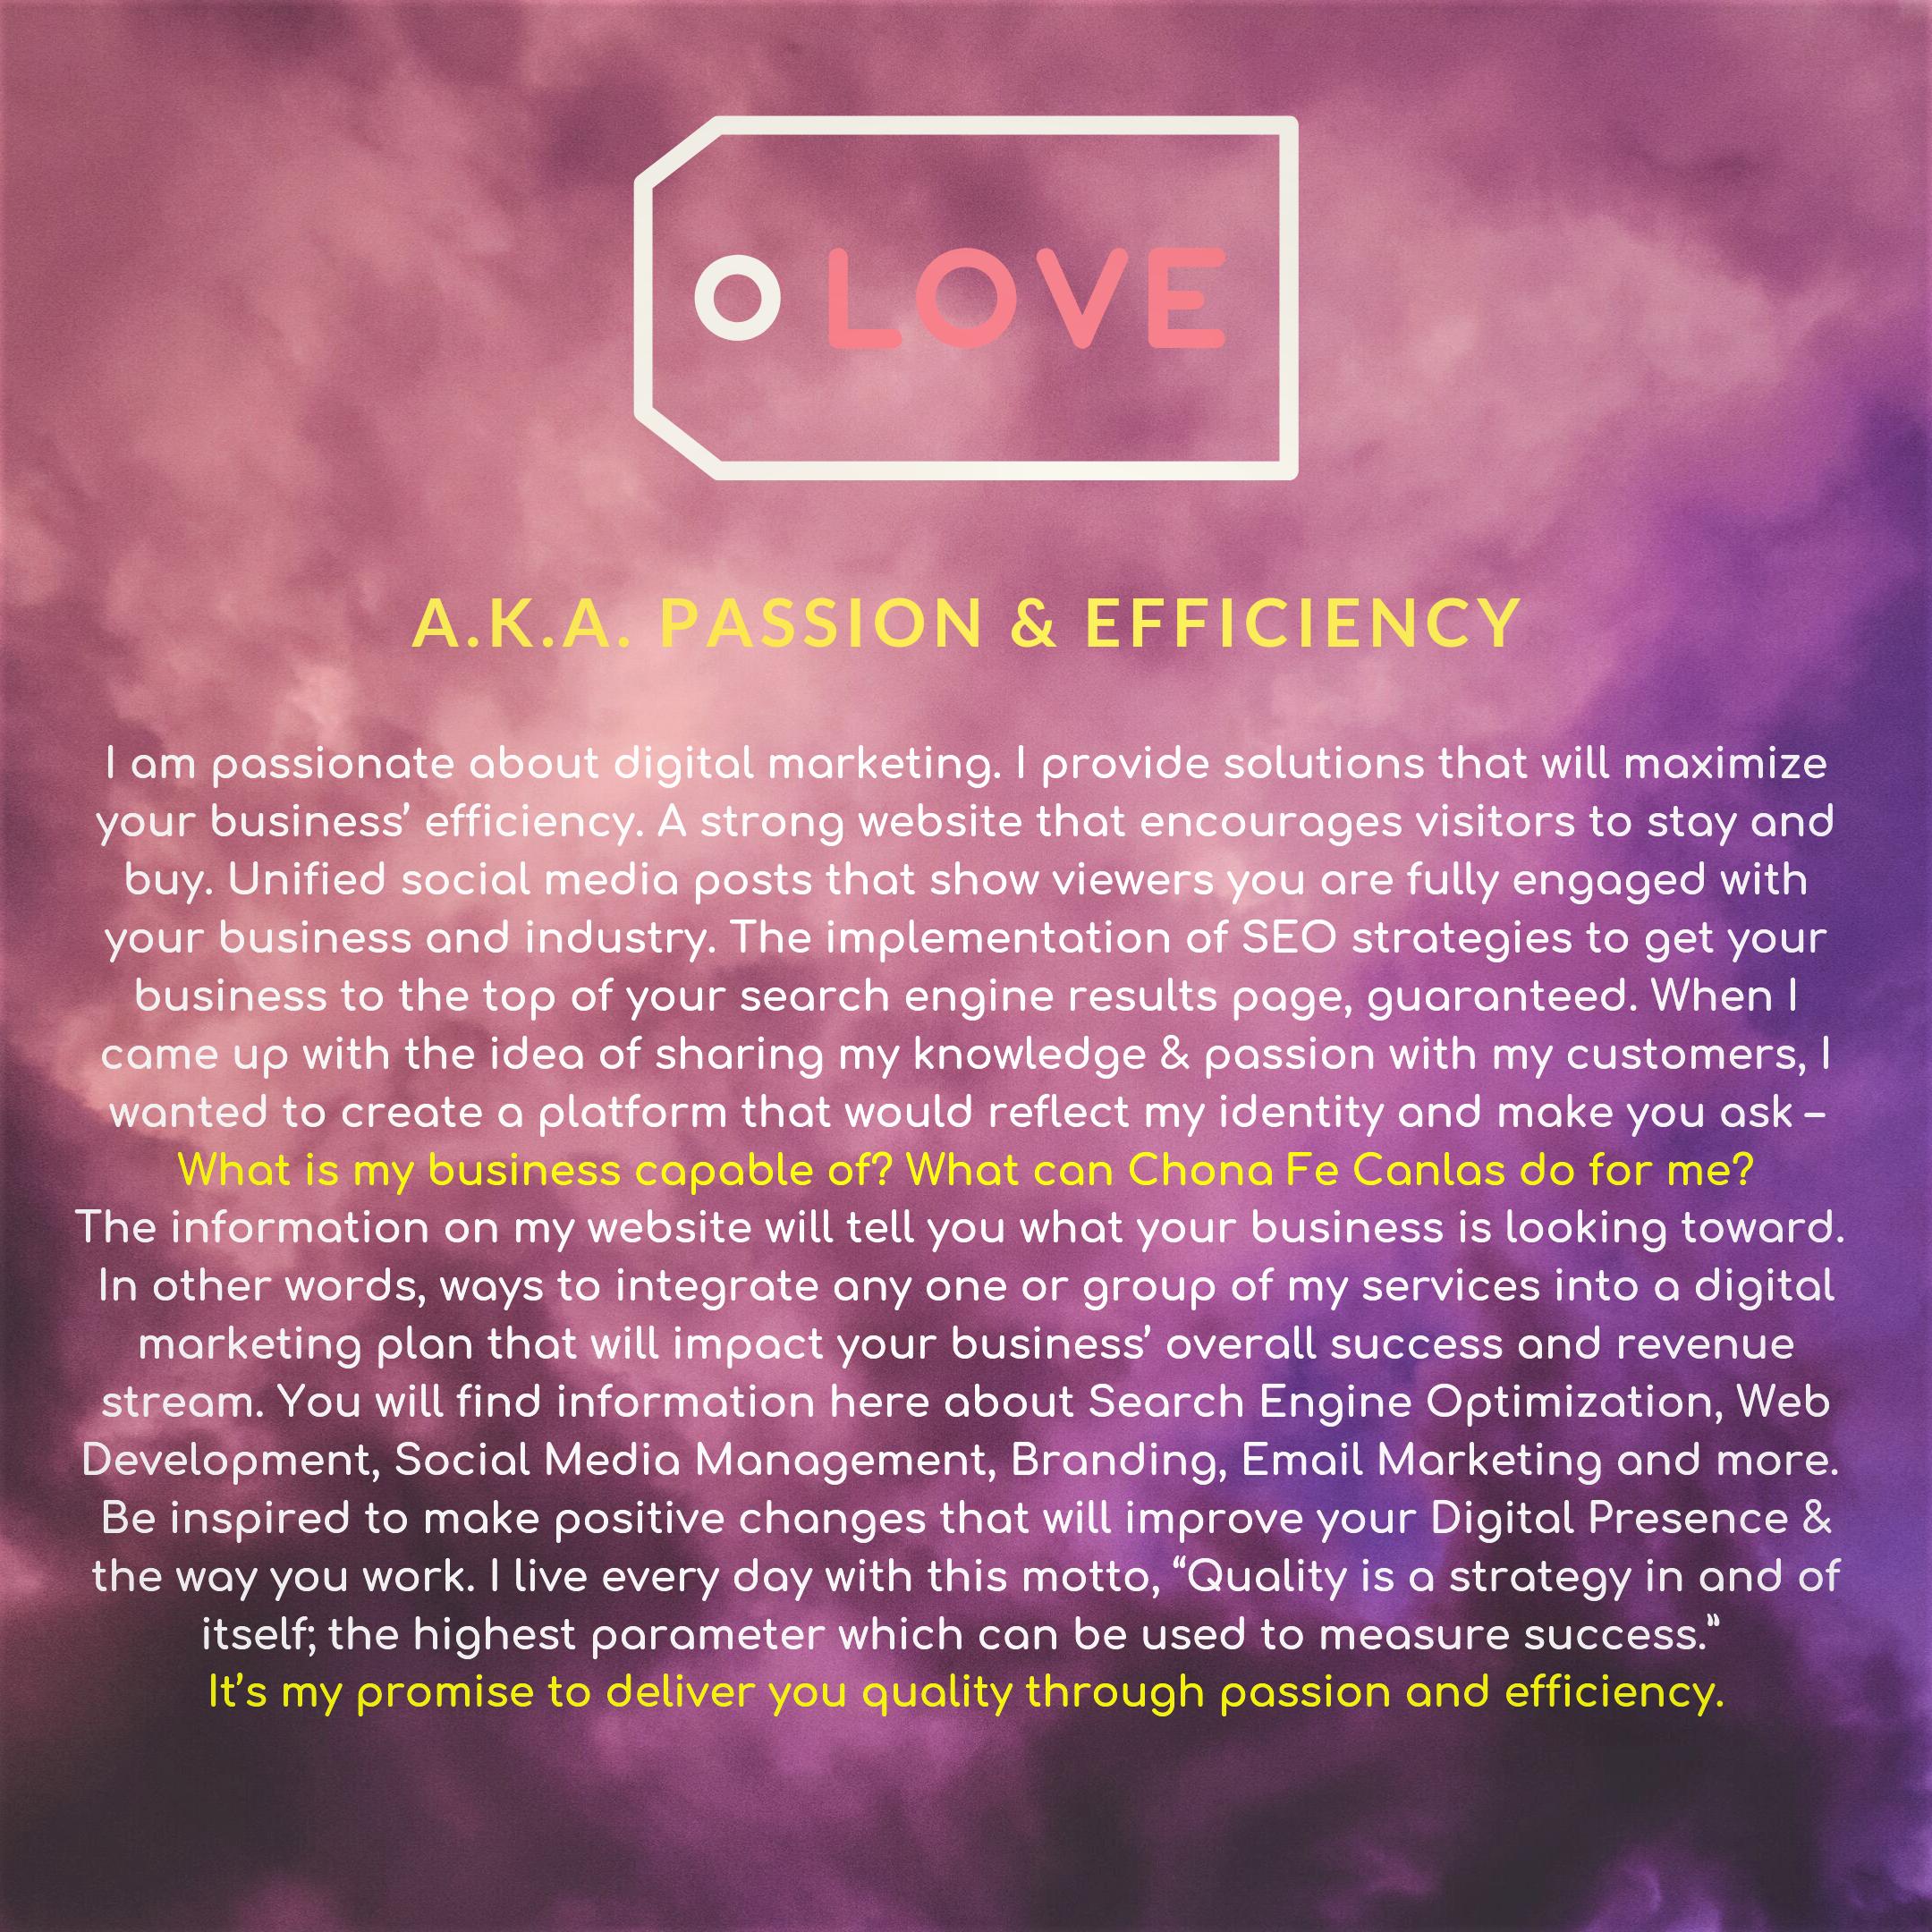 a.k.a. passion & efficiency (2)